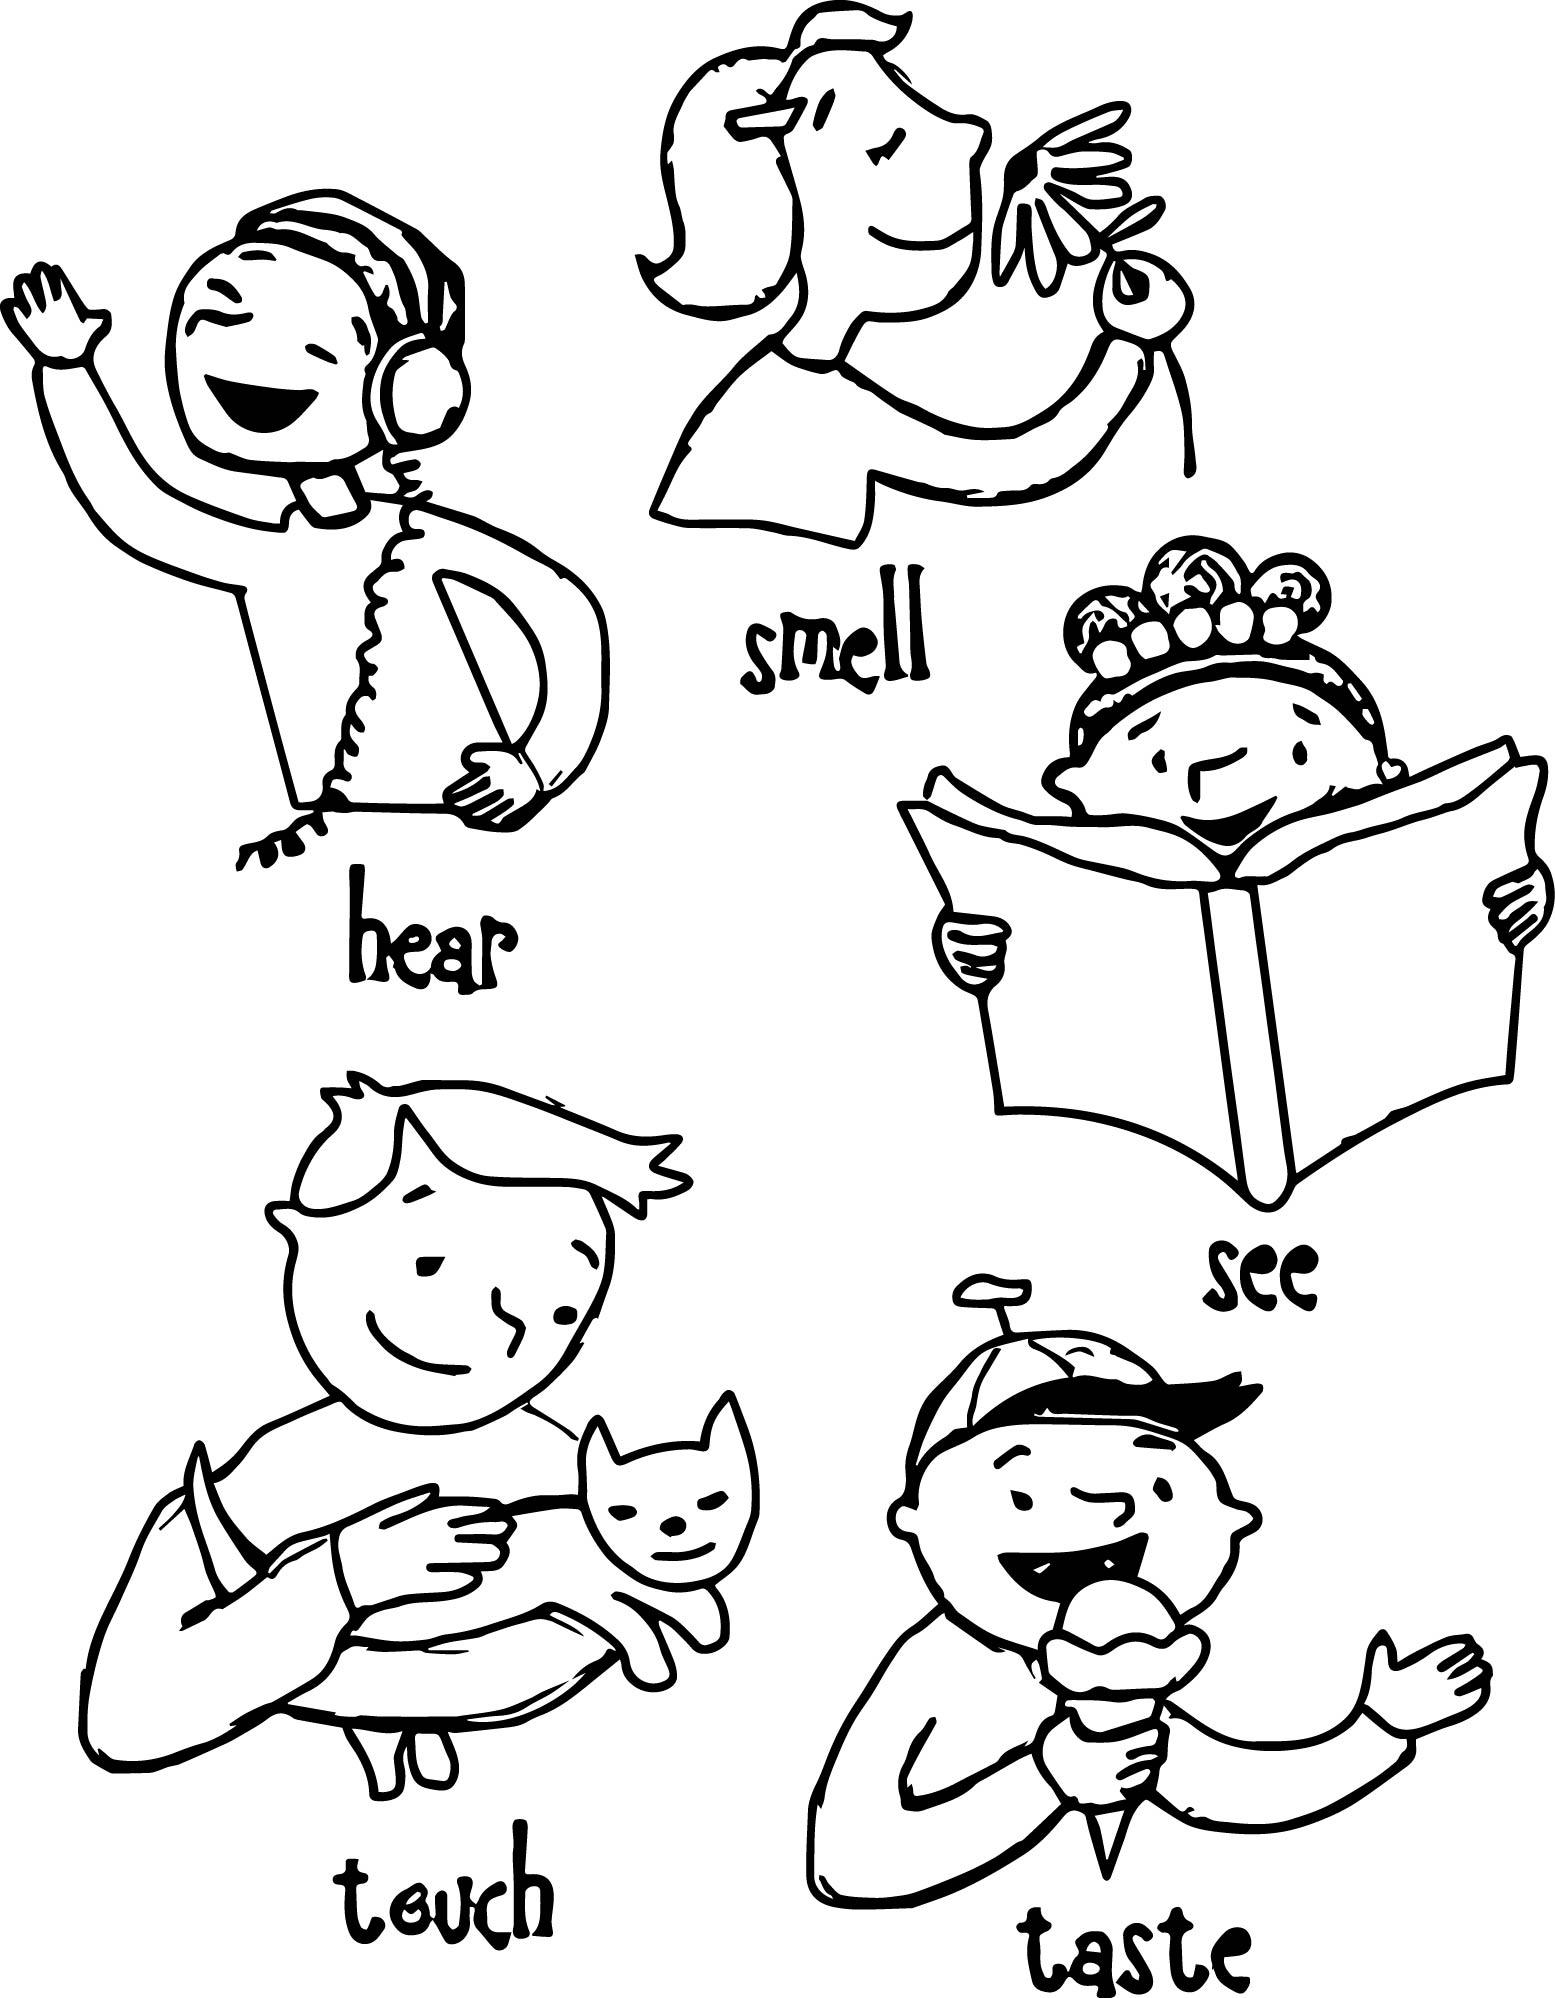 Senses coloring, Download Senses coloring